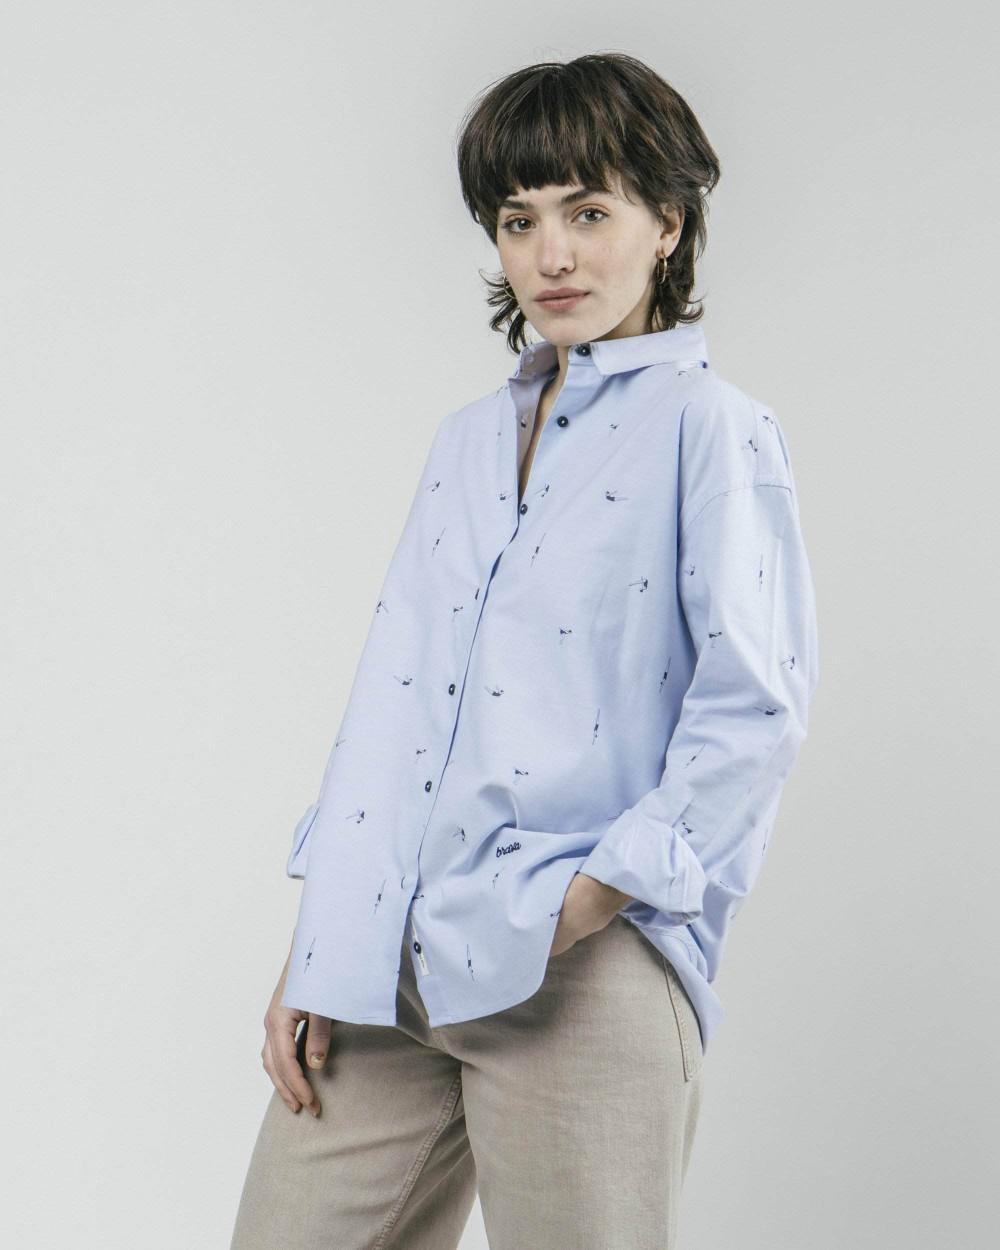 Vintage swimmer oversized blouse - Brava Fabrics